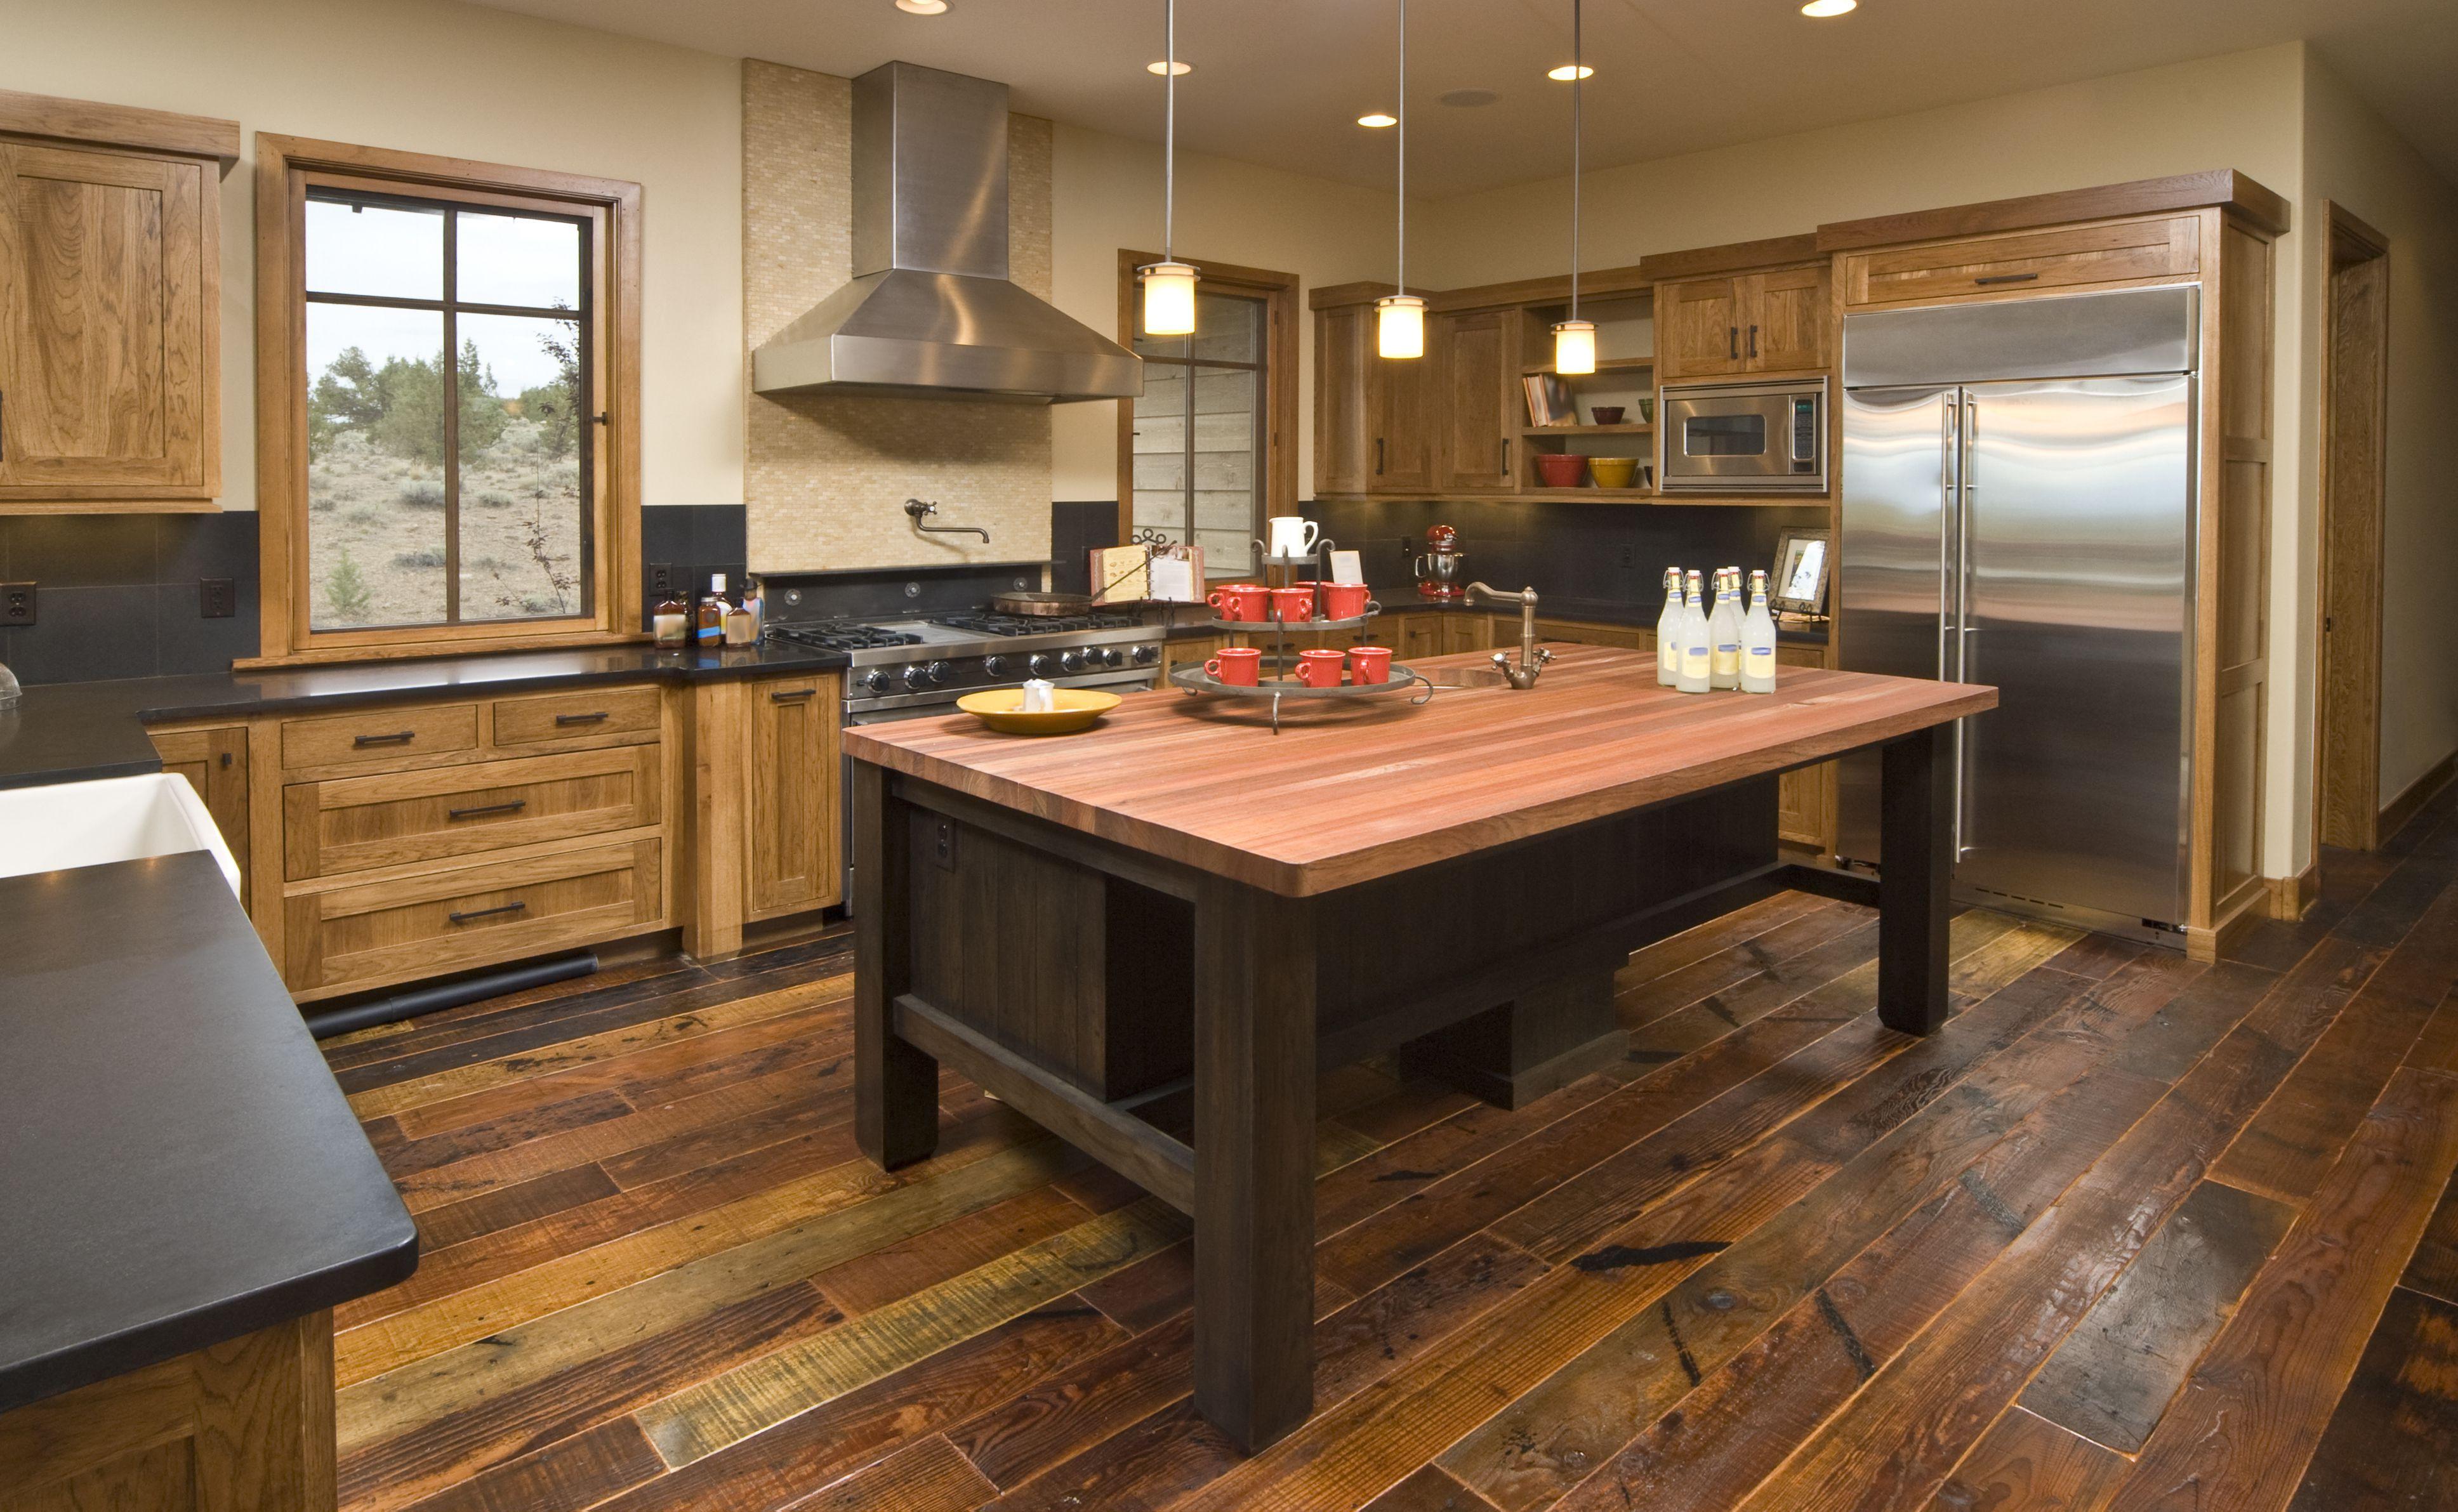 hardwood floor refinishing topeka ks of where to buy reclaimed wood flooring for rustic modern kitchen 157565456 58ae76a73df78c345ba2f5d1